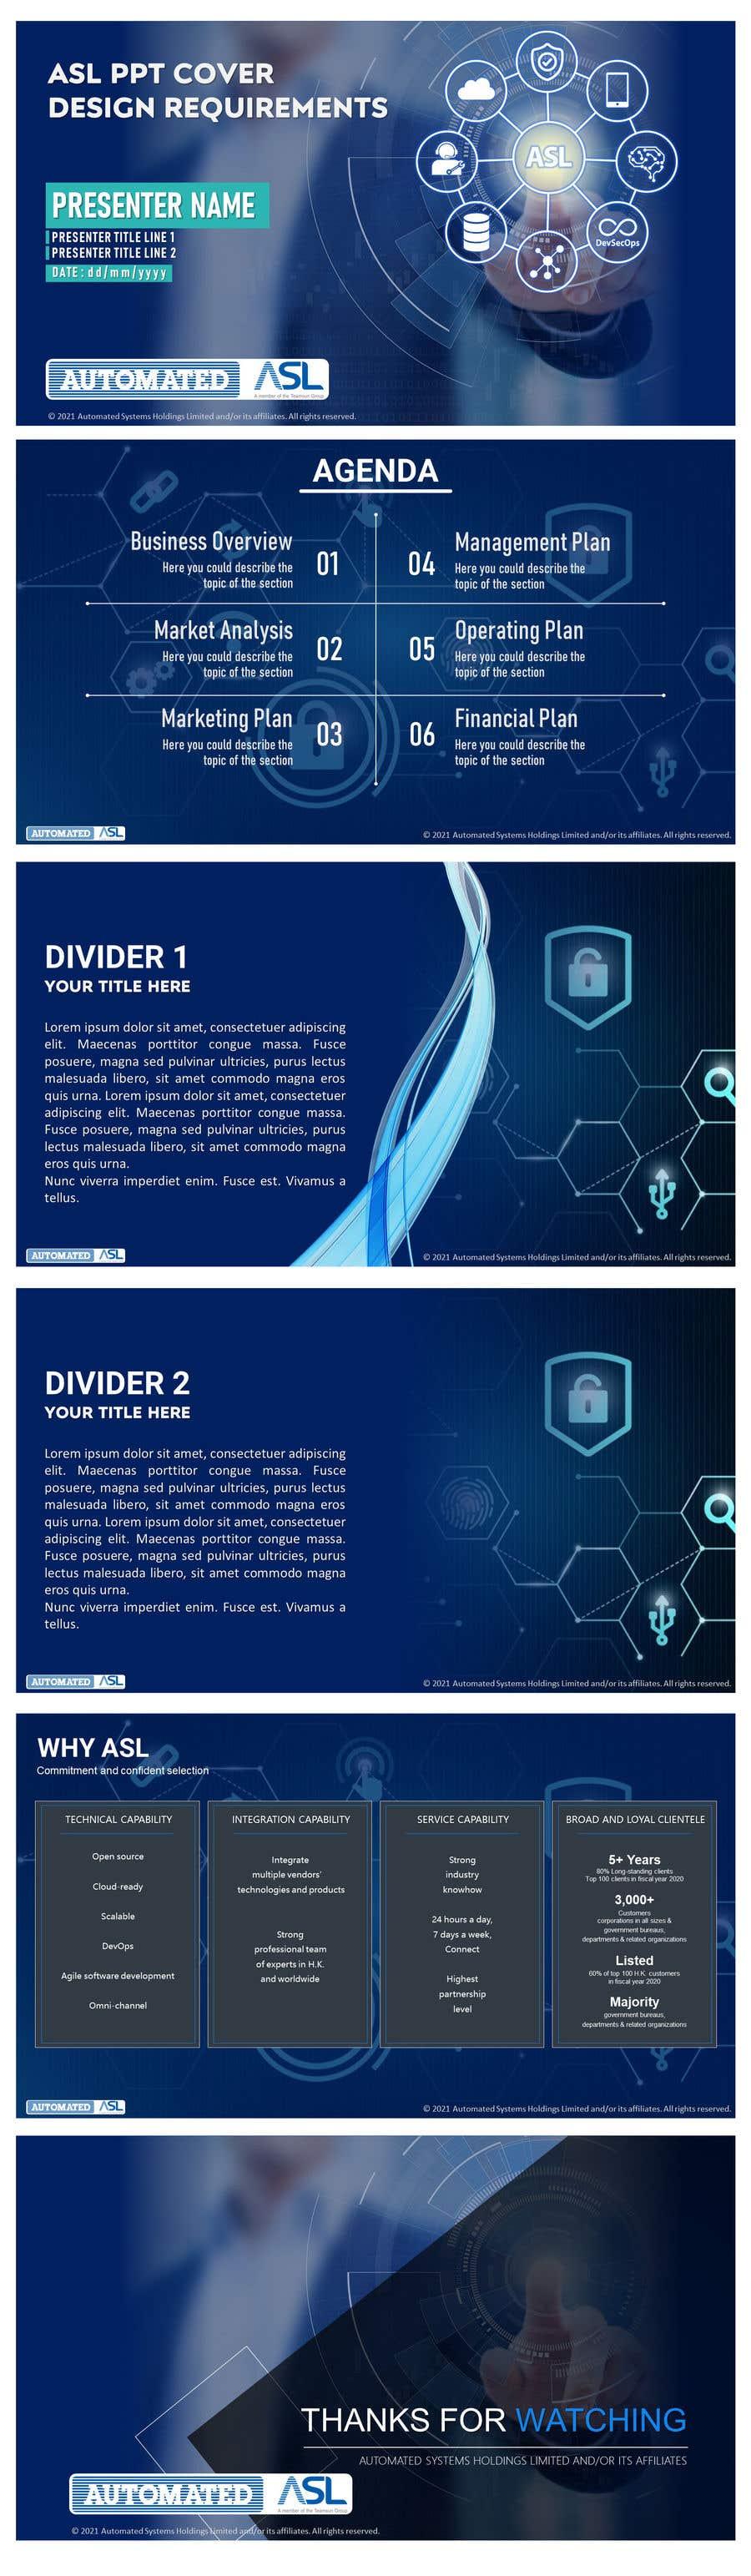 Bài tham dự cuộc thi #                                        49                                      cho                                         Corporate PPT Template Design (6 slides)